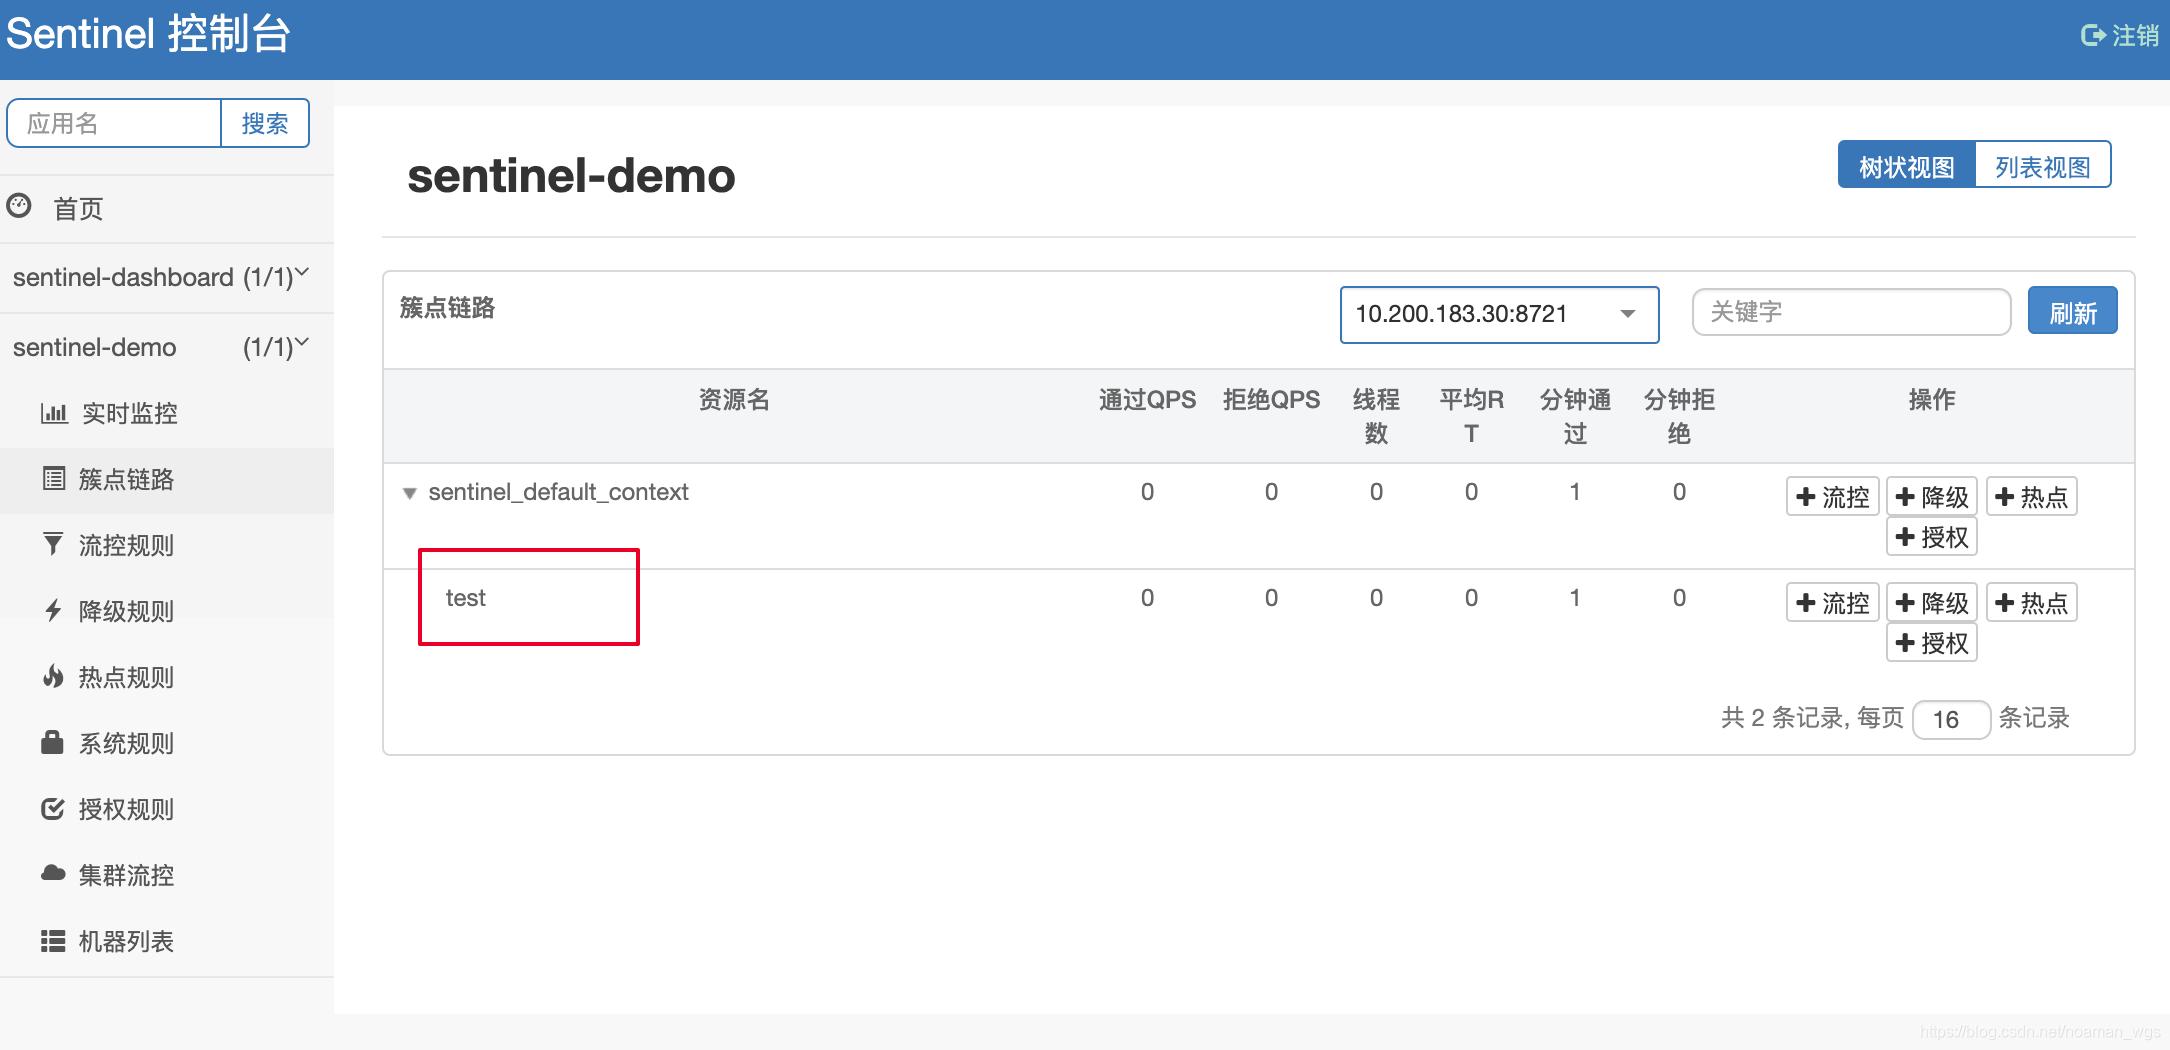 [外链图片转存失败,源站可能有防盗链机制,建议将图片保存下来直接上传(img-kc56Vgu1-1575117332207)(/Users/wanggenshen/Library/Application%20Support/typora-user-images/image-20191130201216117.png)]